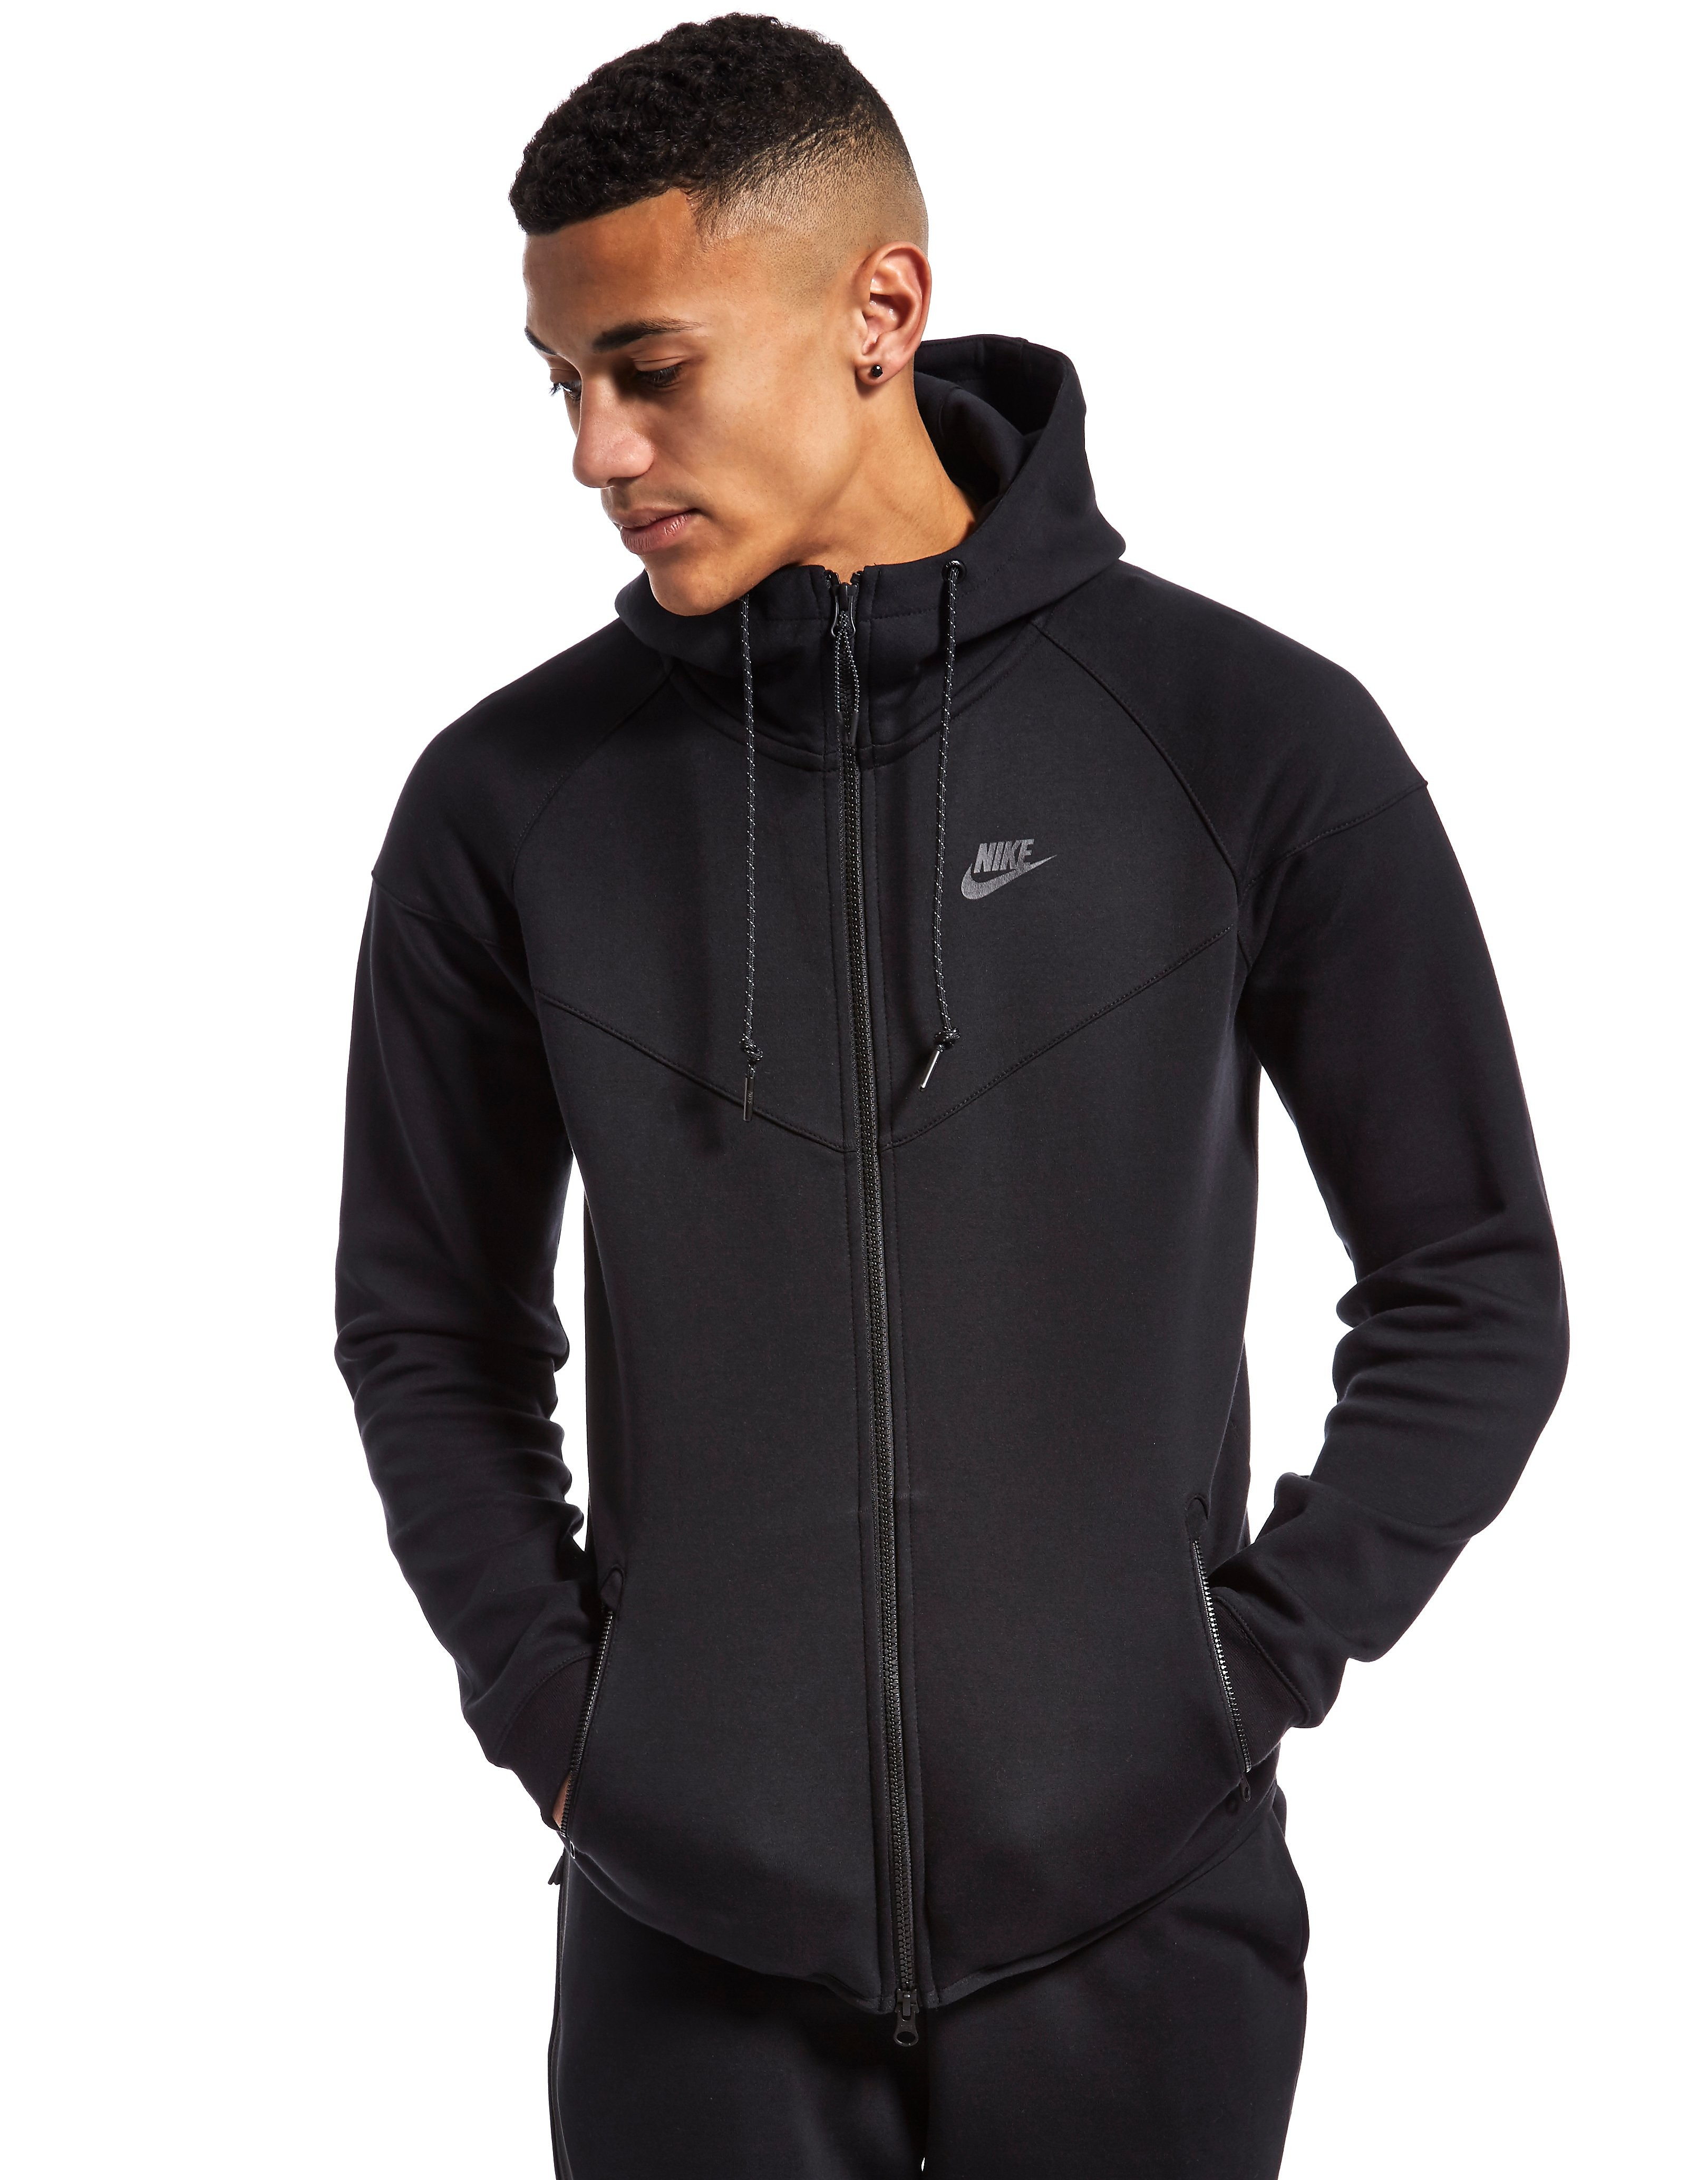 men 39 s hoodies zip up hoodies and pullover hoodies jd. Black Bedroom Furniture Sets. Home Design Ideas